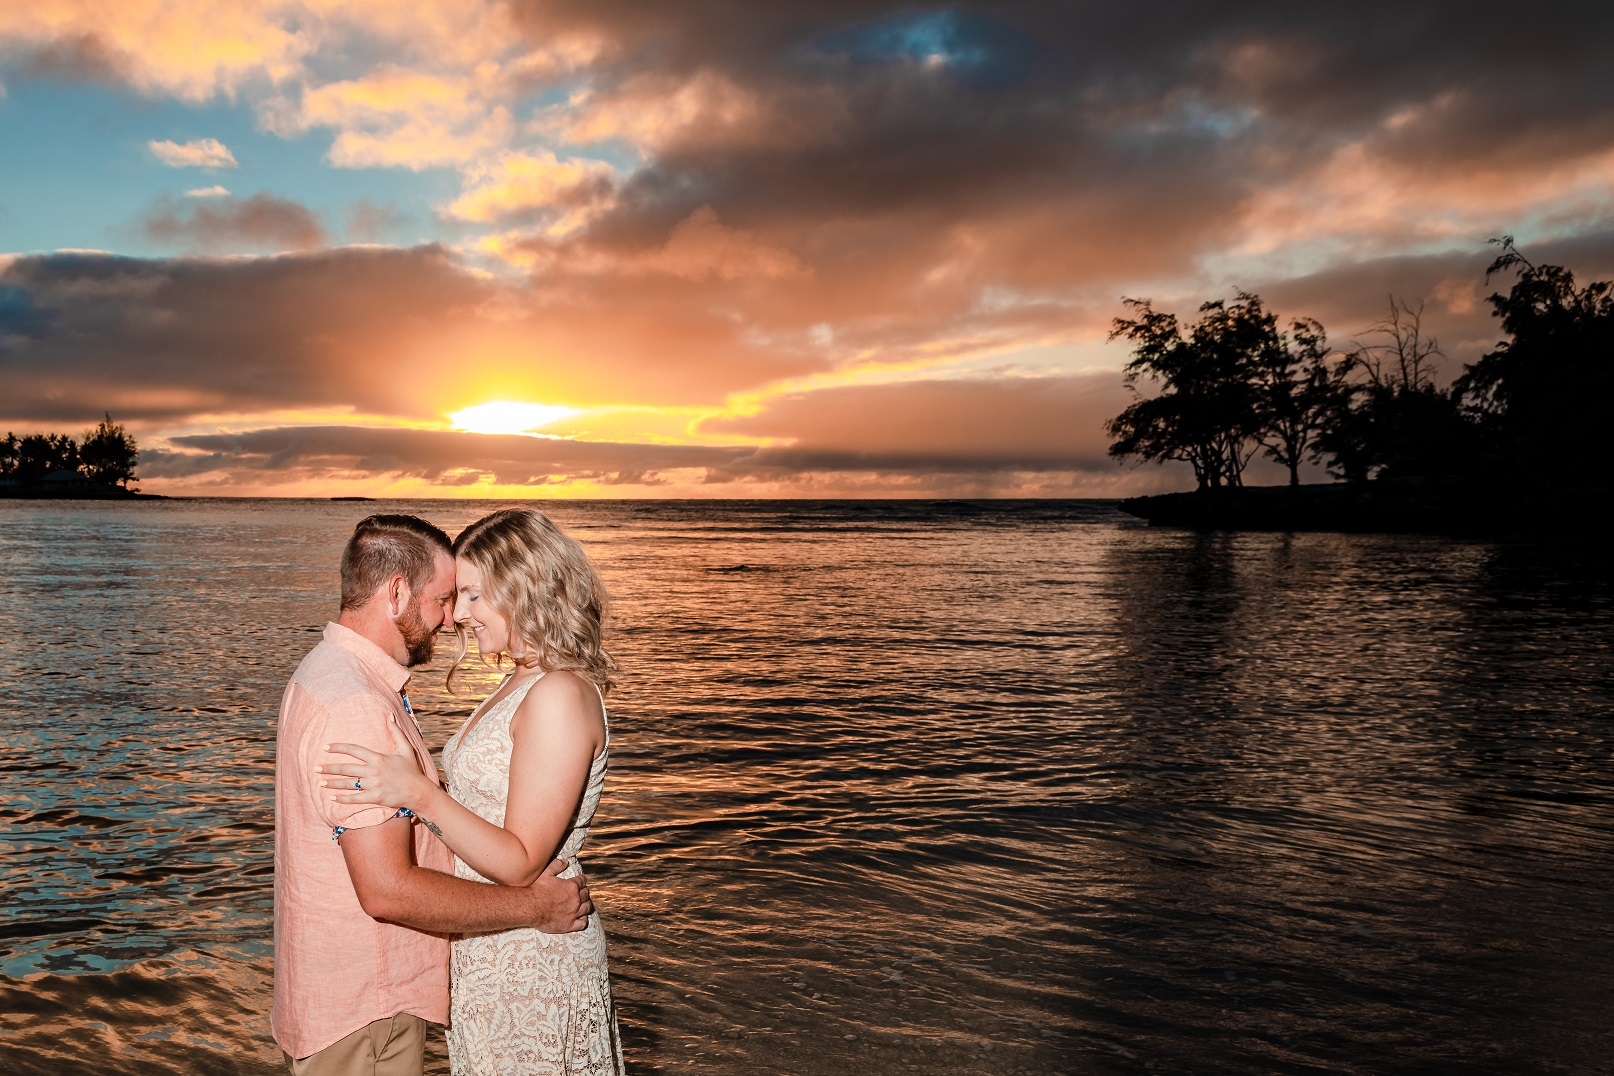 sunset anniversary couples portrait north shore oahu